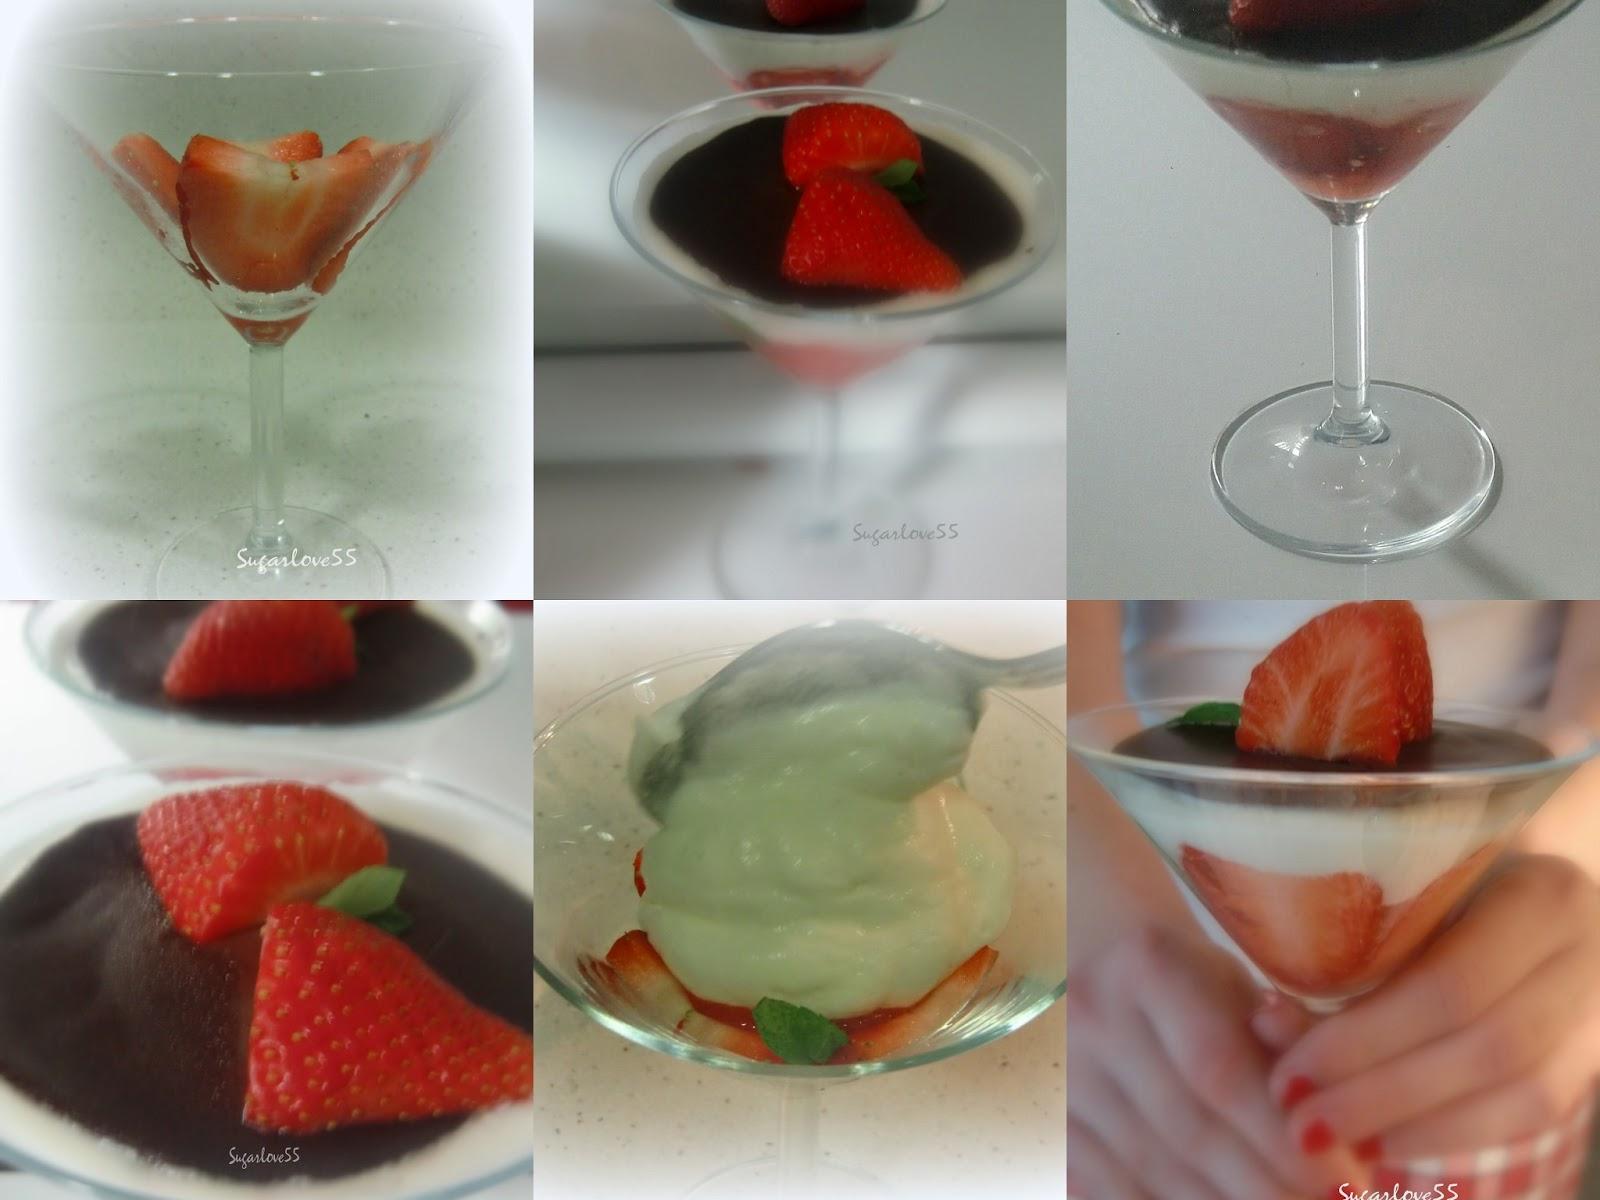 Sugarlove55 mousse de yogurt y fresas con tapa de chocolate - Mouse de yogurt ...